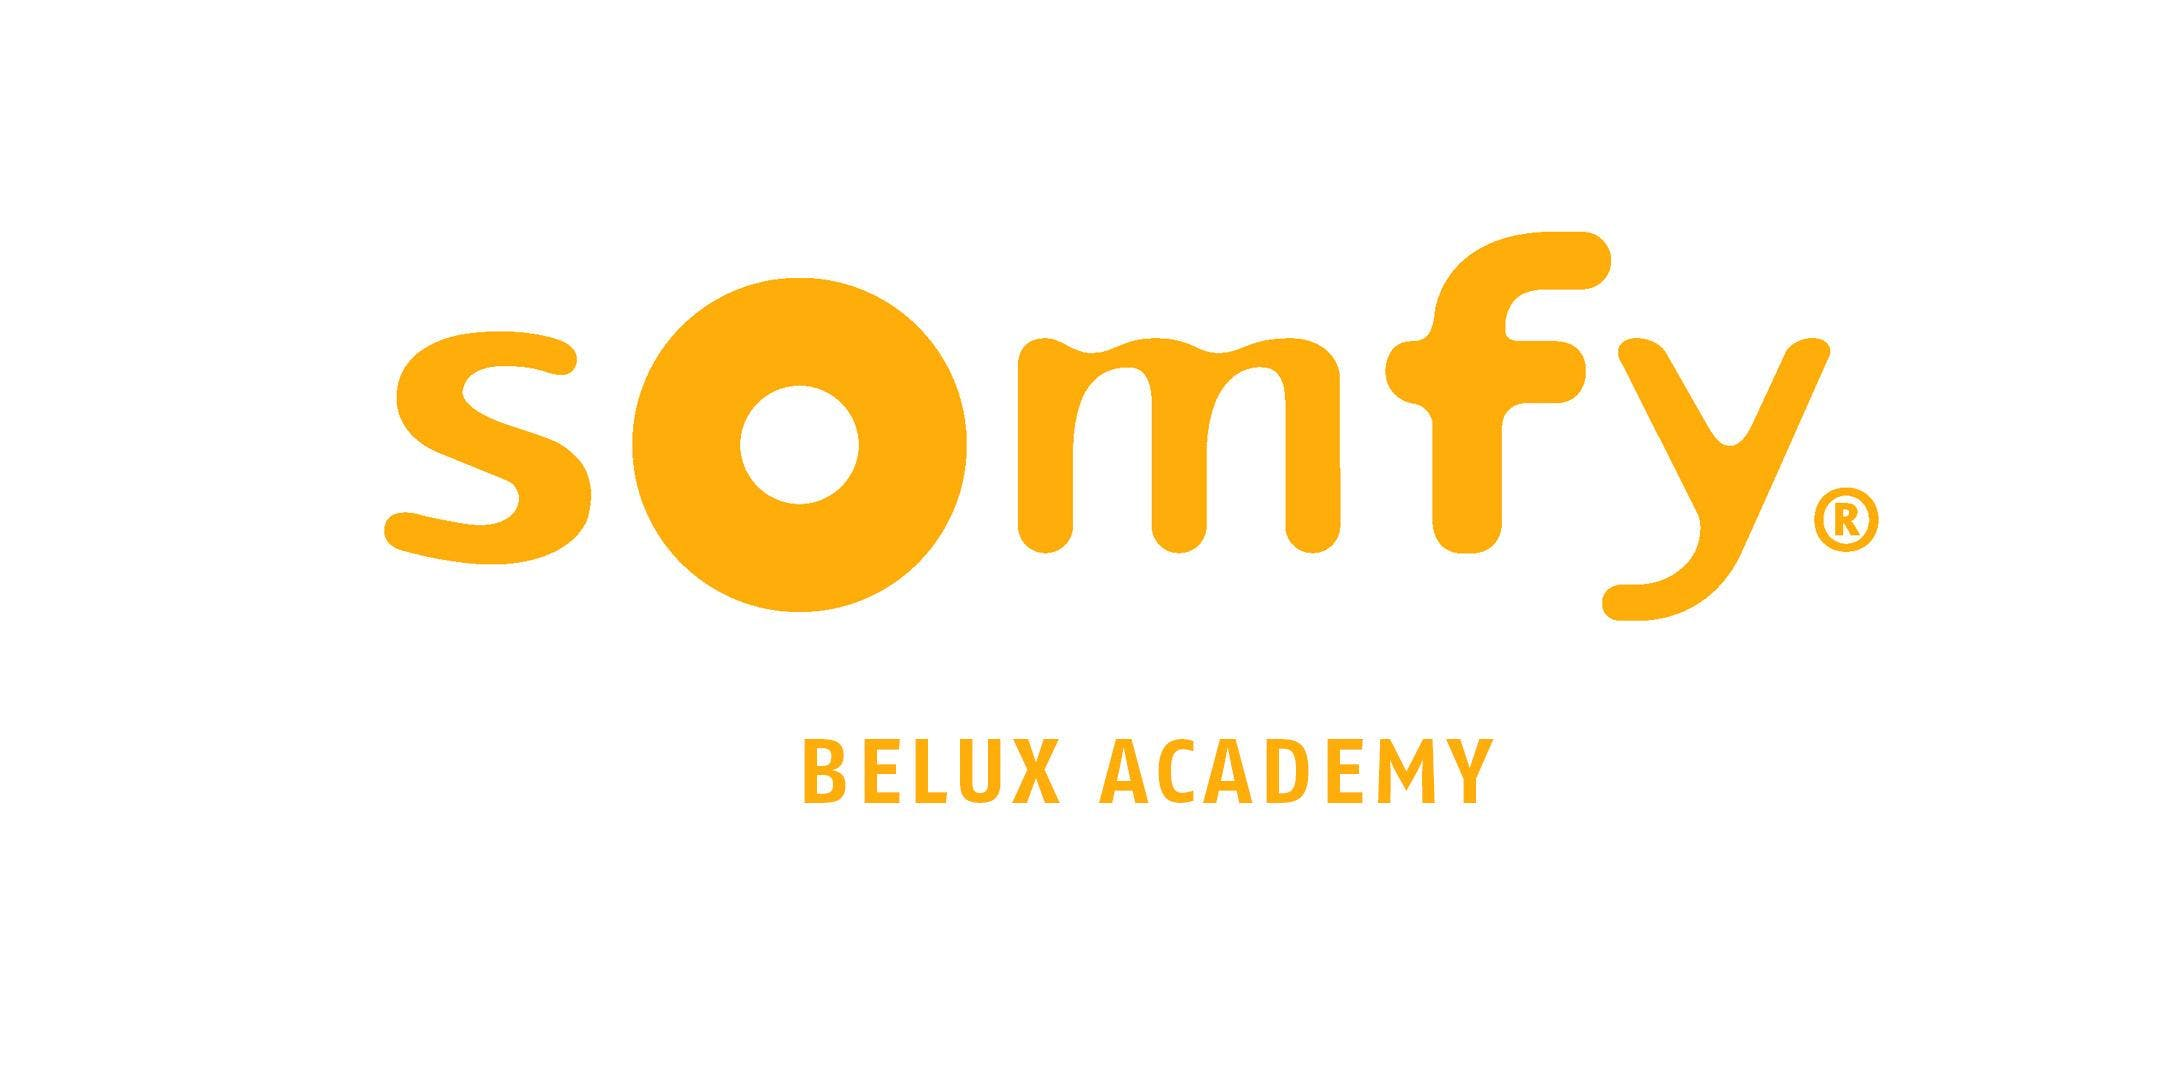 Formation TaHoma ® – Smarthome / Connexoon ® io FR